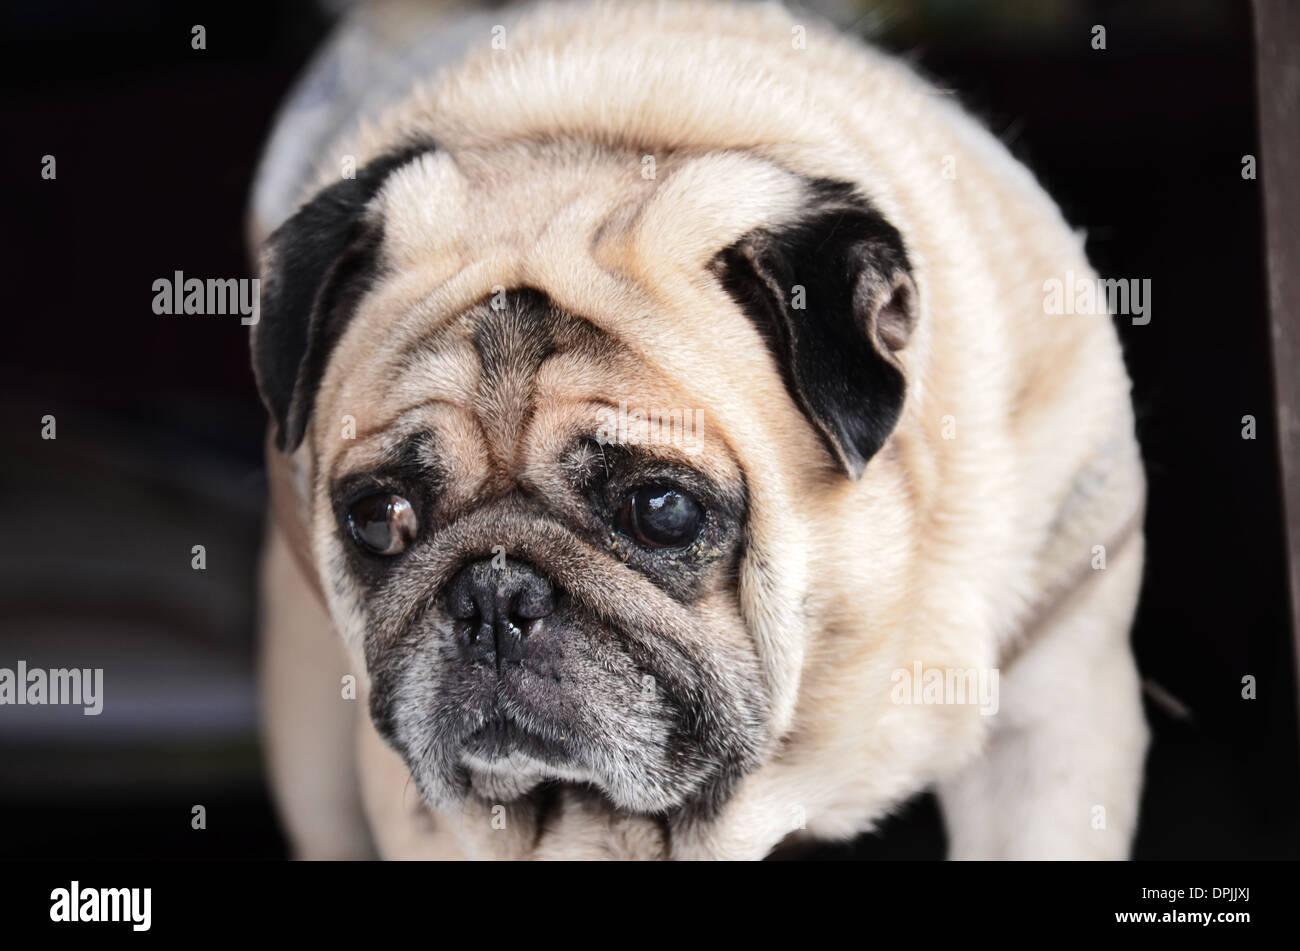 Cute A Pug Dog Stock Photo 65563530 Alamy